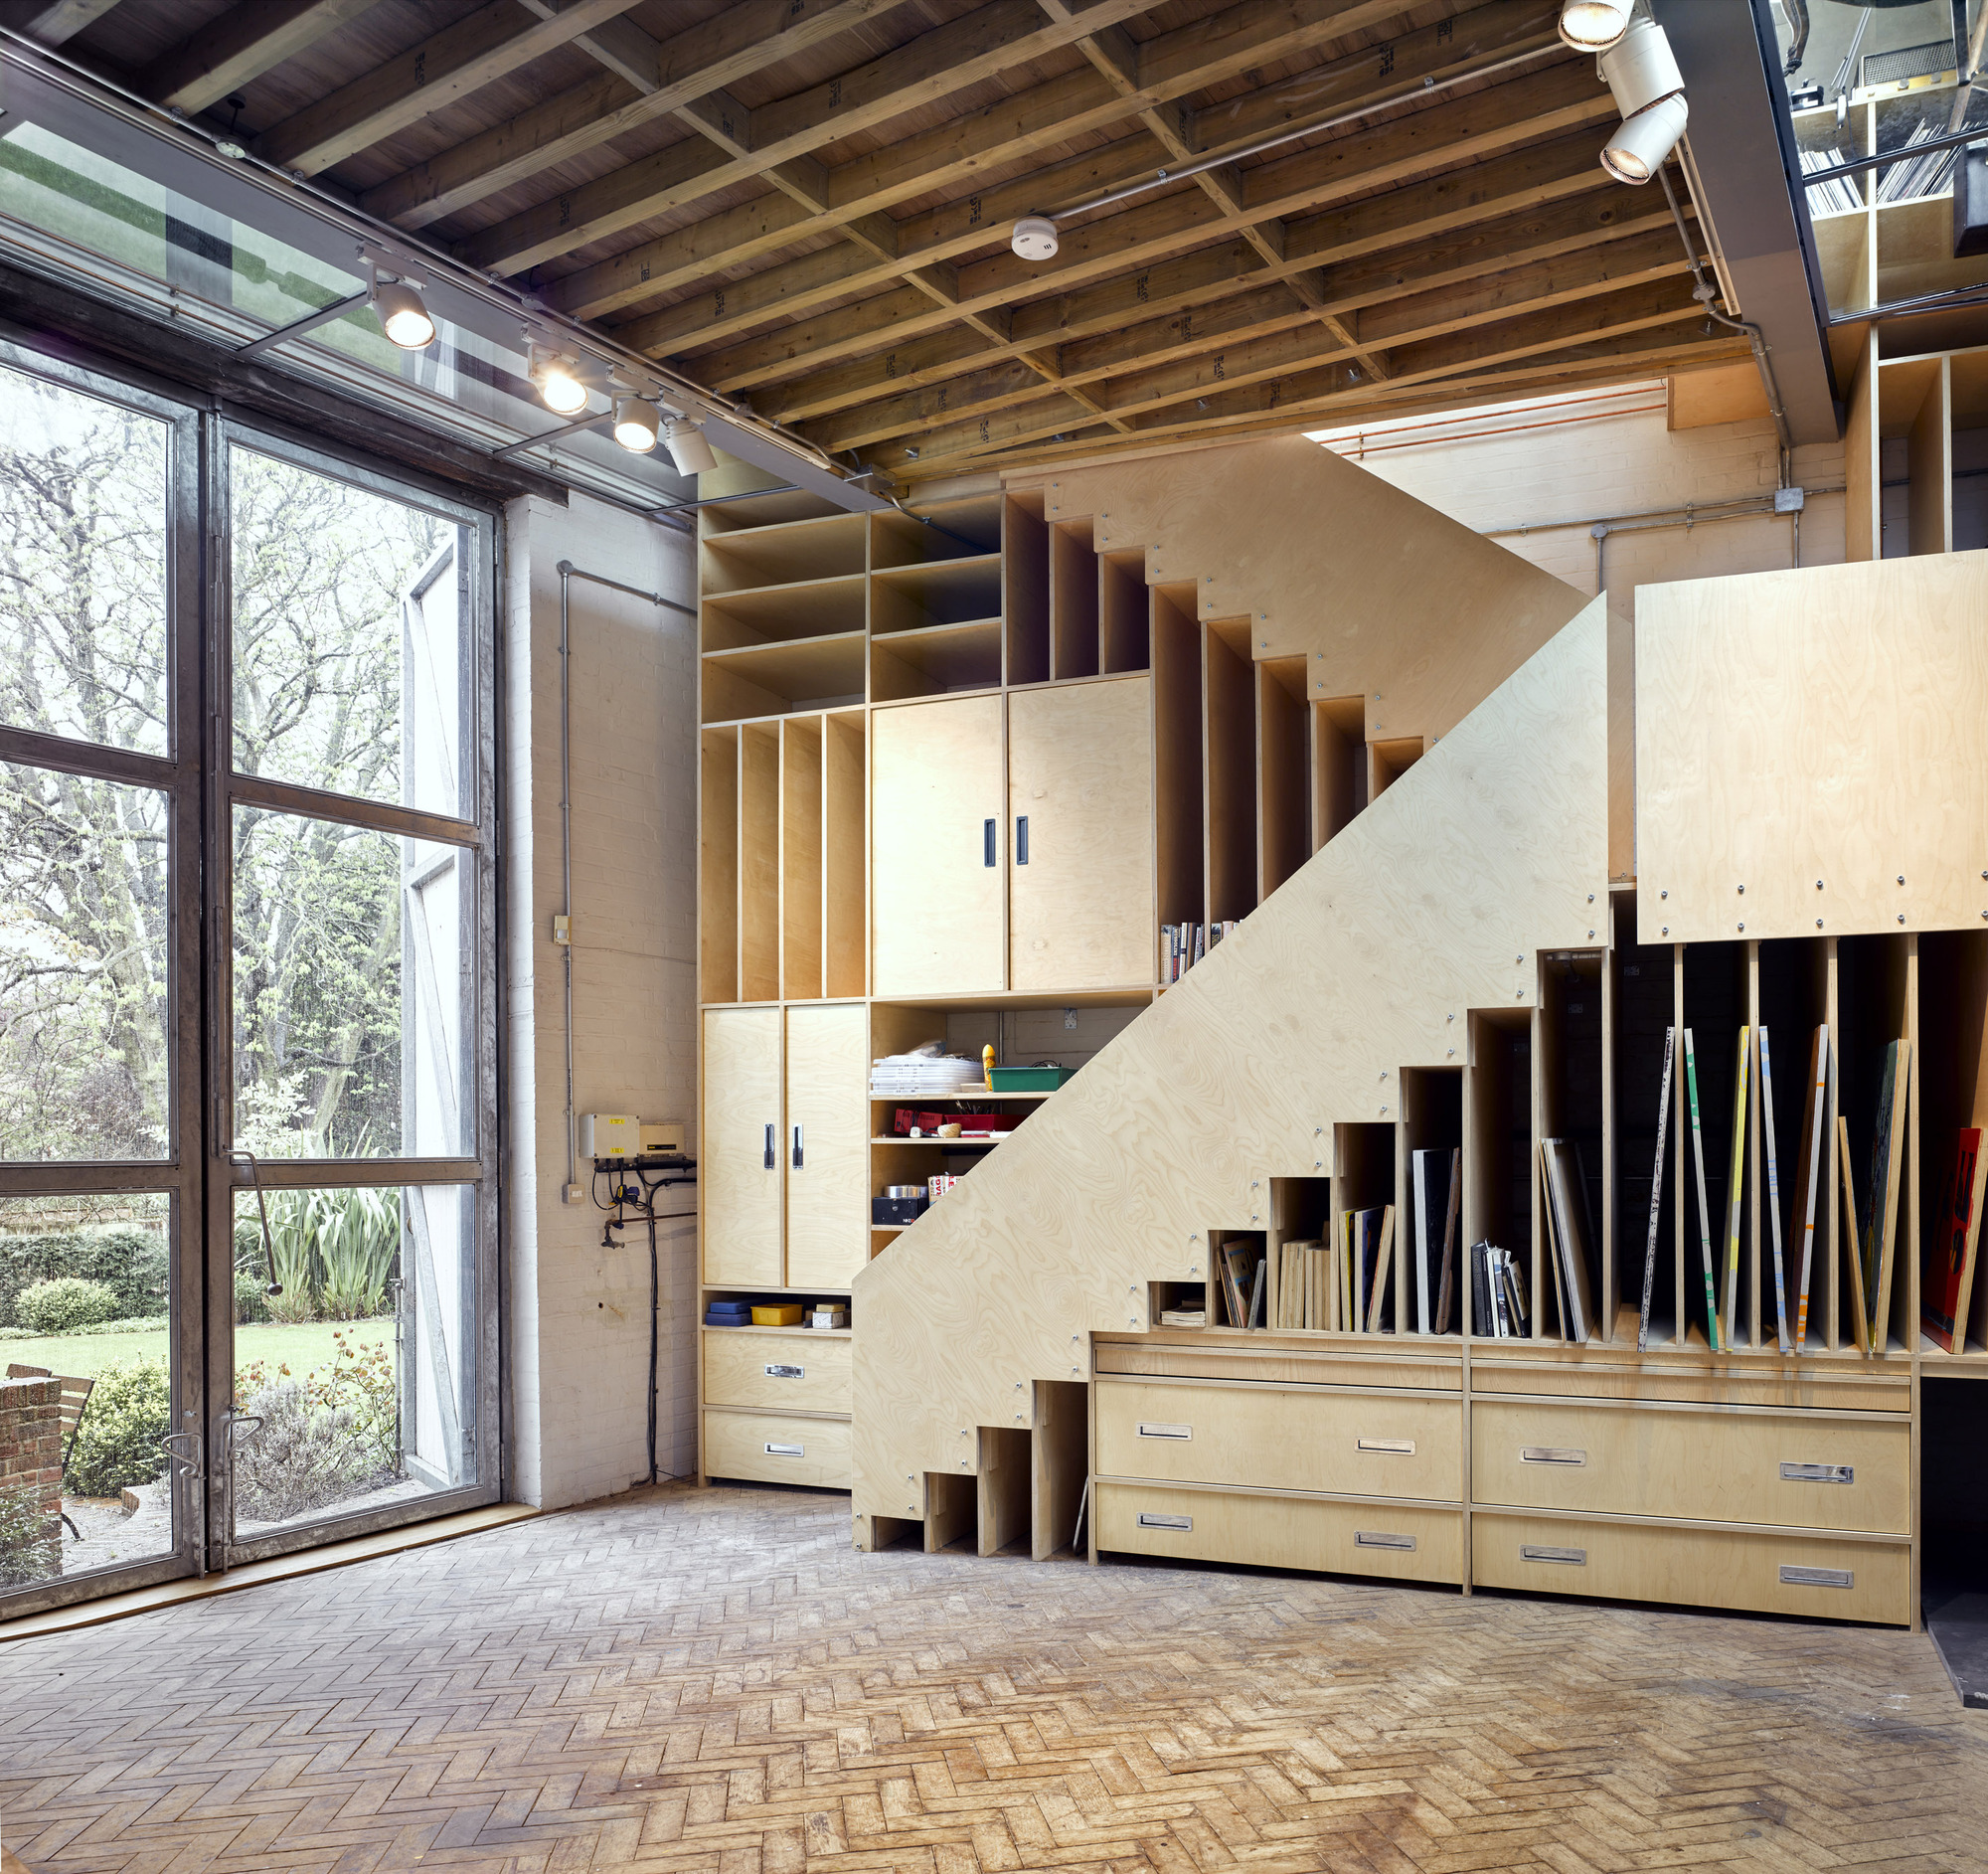 gallery of greville road studio syte architects 1. Black Bedroom Furniture Sets. Home Design Ideas